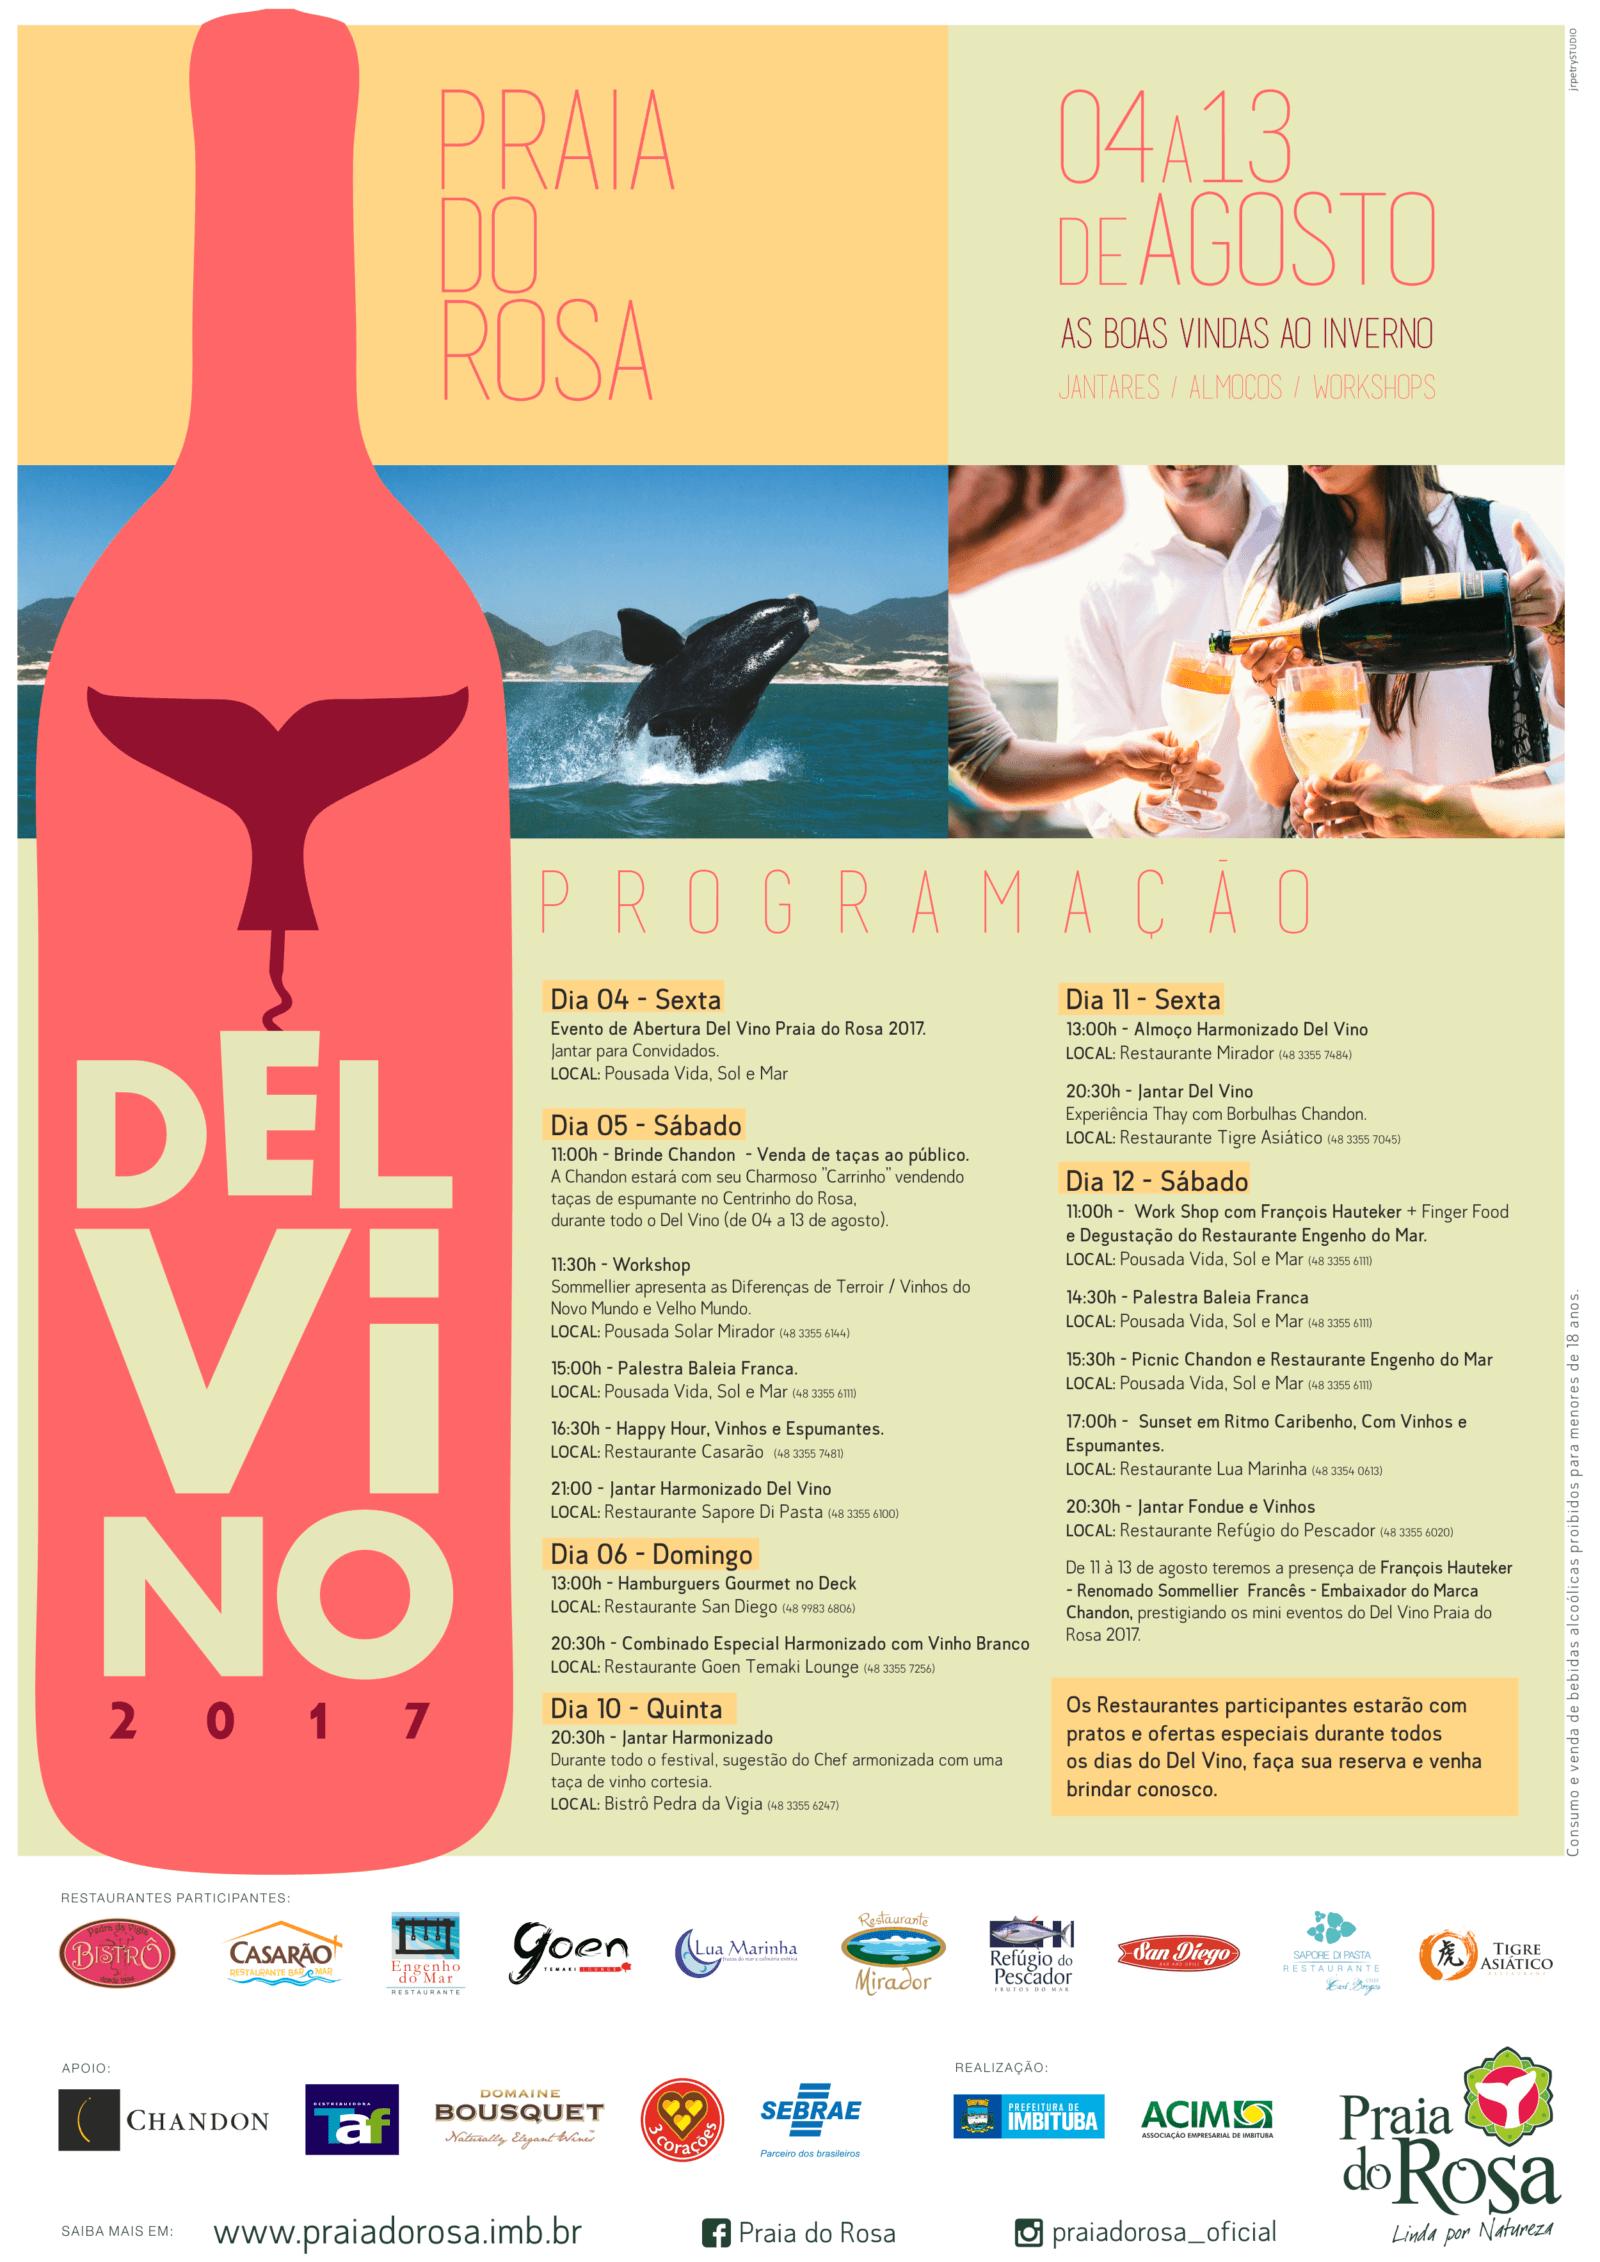 Agosto Del Vino na Praia do Rosa começa neste final de semana!